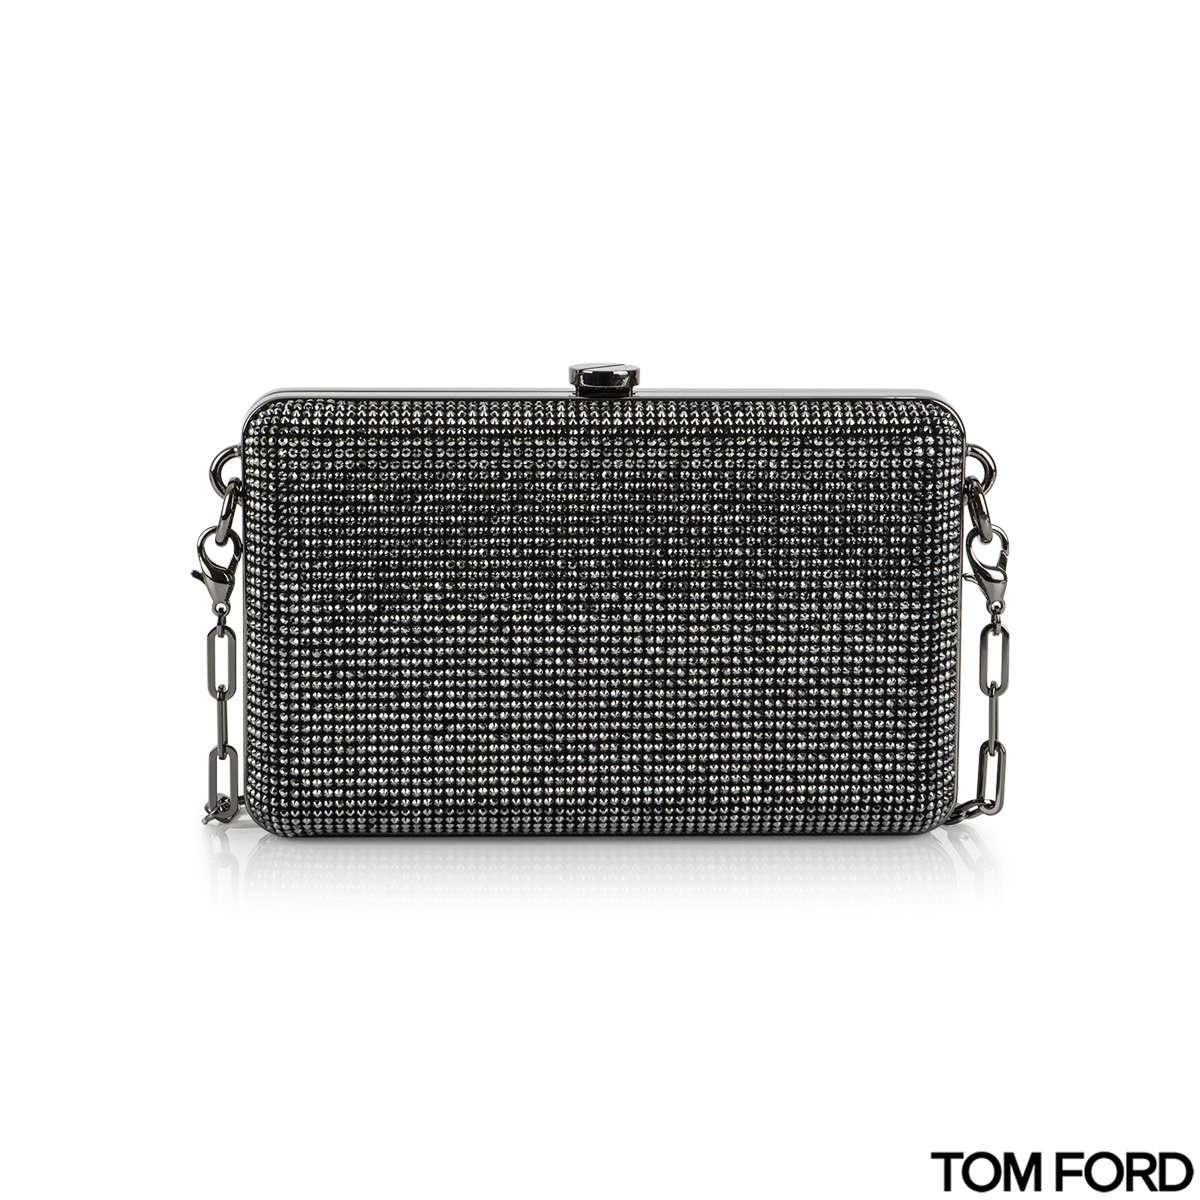 Tom Ford  Crystal-Embellished Mini Silver Suede Clutch Bag